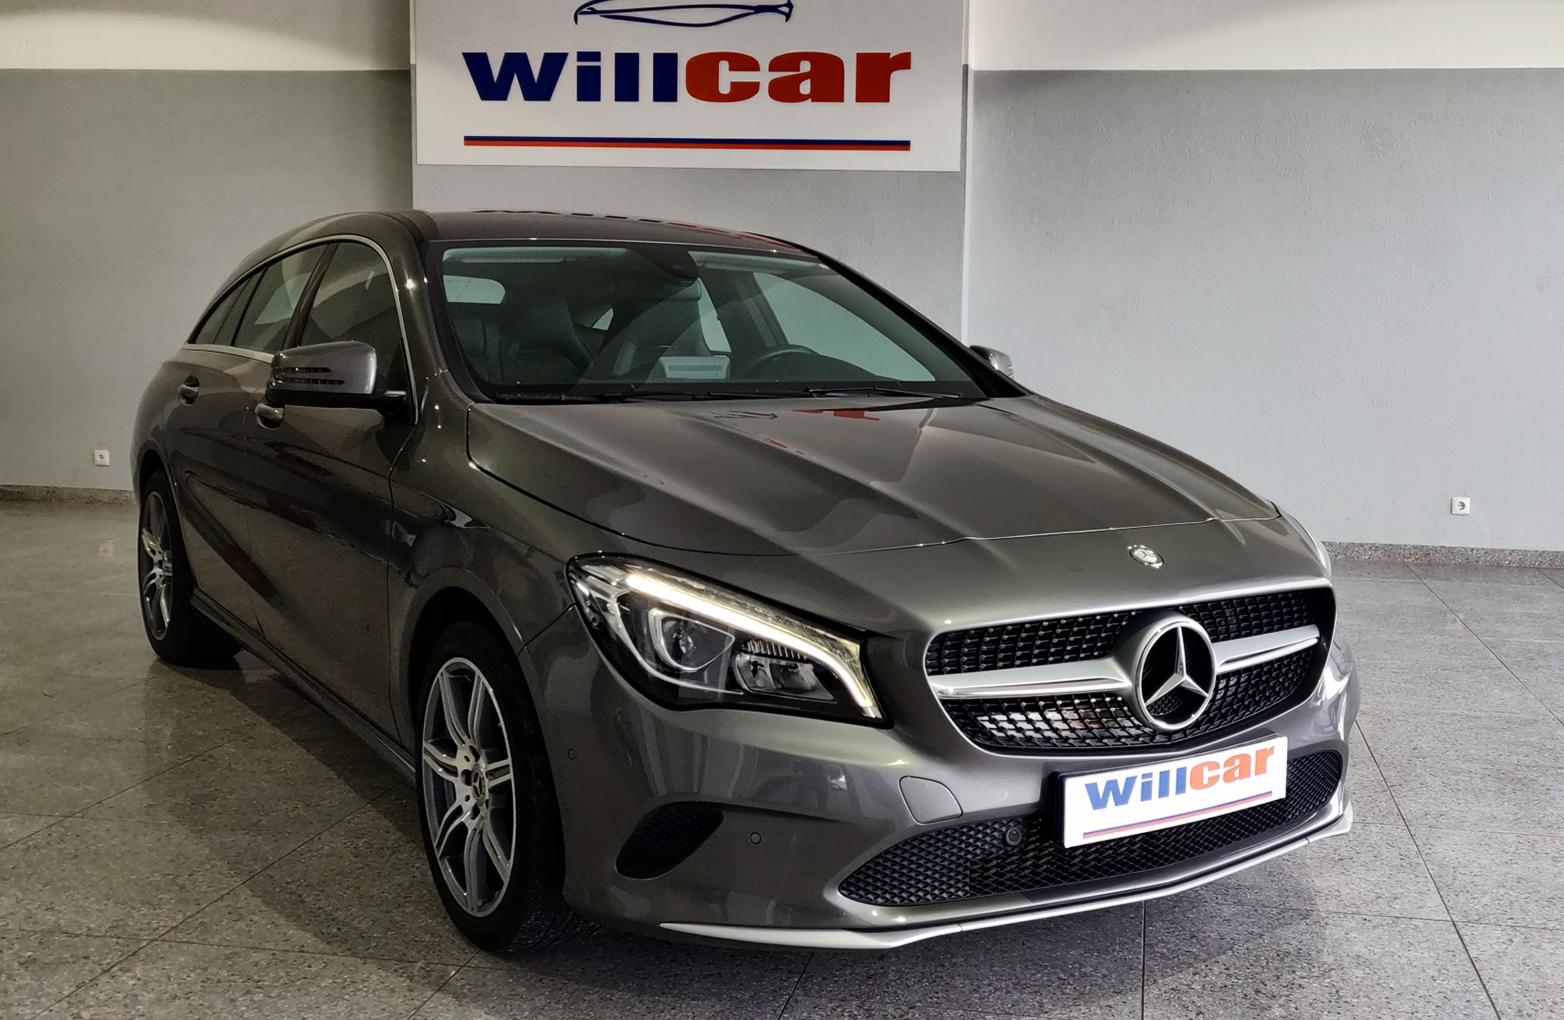 Mercedes-Benz CLA 180 1.5 Style | Imagem 1